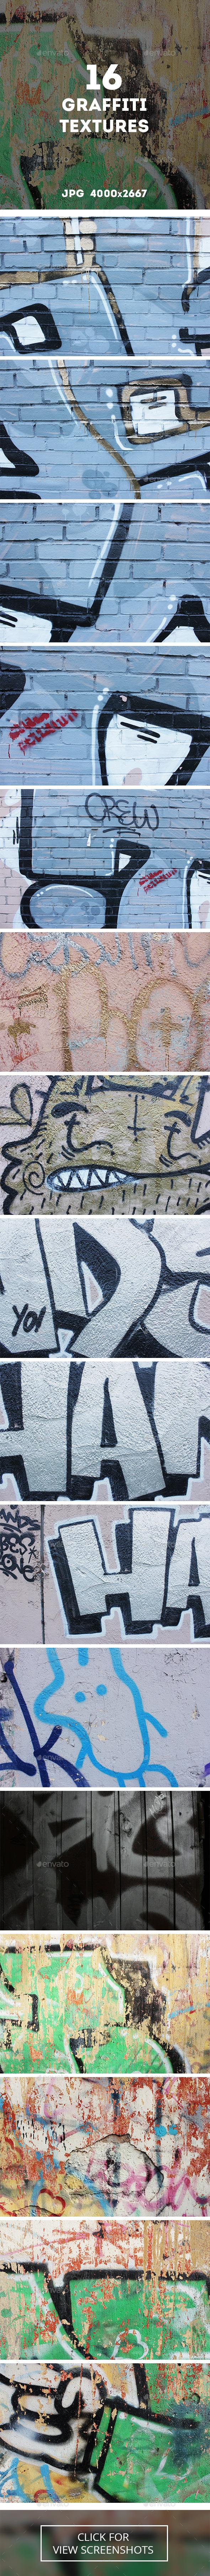 16 hi-res JPG Graffiti Textures 4000×2667 px, Download: http://graphicriver.net/item/16-graffiti-textures/12984623?ref=AVAVO  #freestyle, #graffiti, #graffitibackground, #graffititexture, #graffity, #grafiti, #grunge, #grungebackground, #grungetexture, #hiphop, # multicolor, #paint, #sprayer, #street, #streetart, #urban, #urbanart, #urban #design